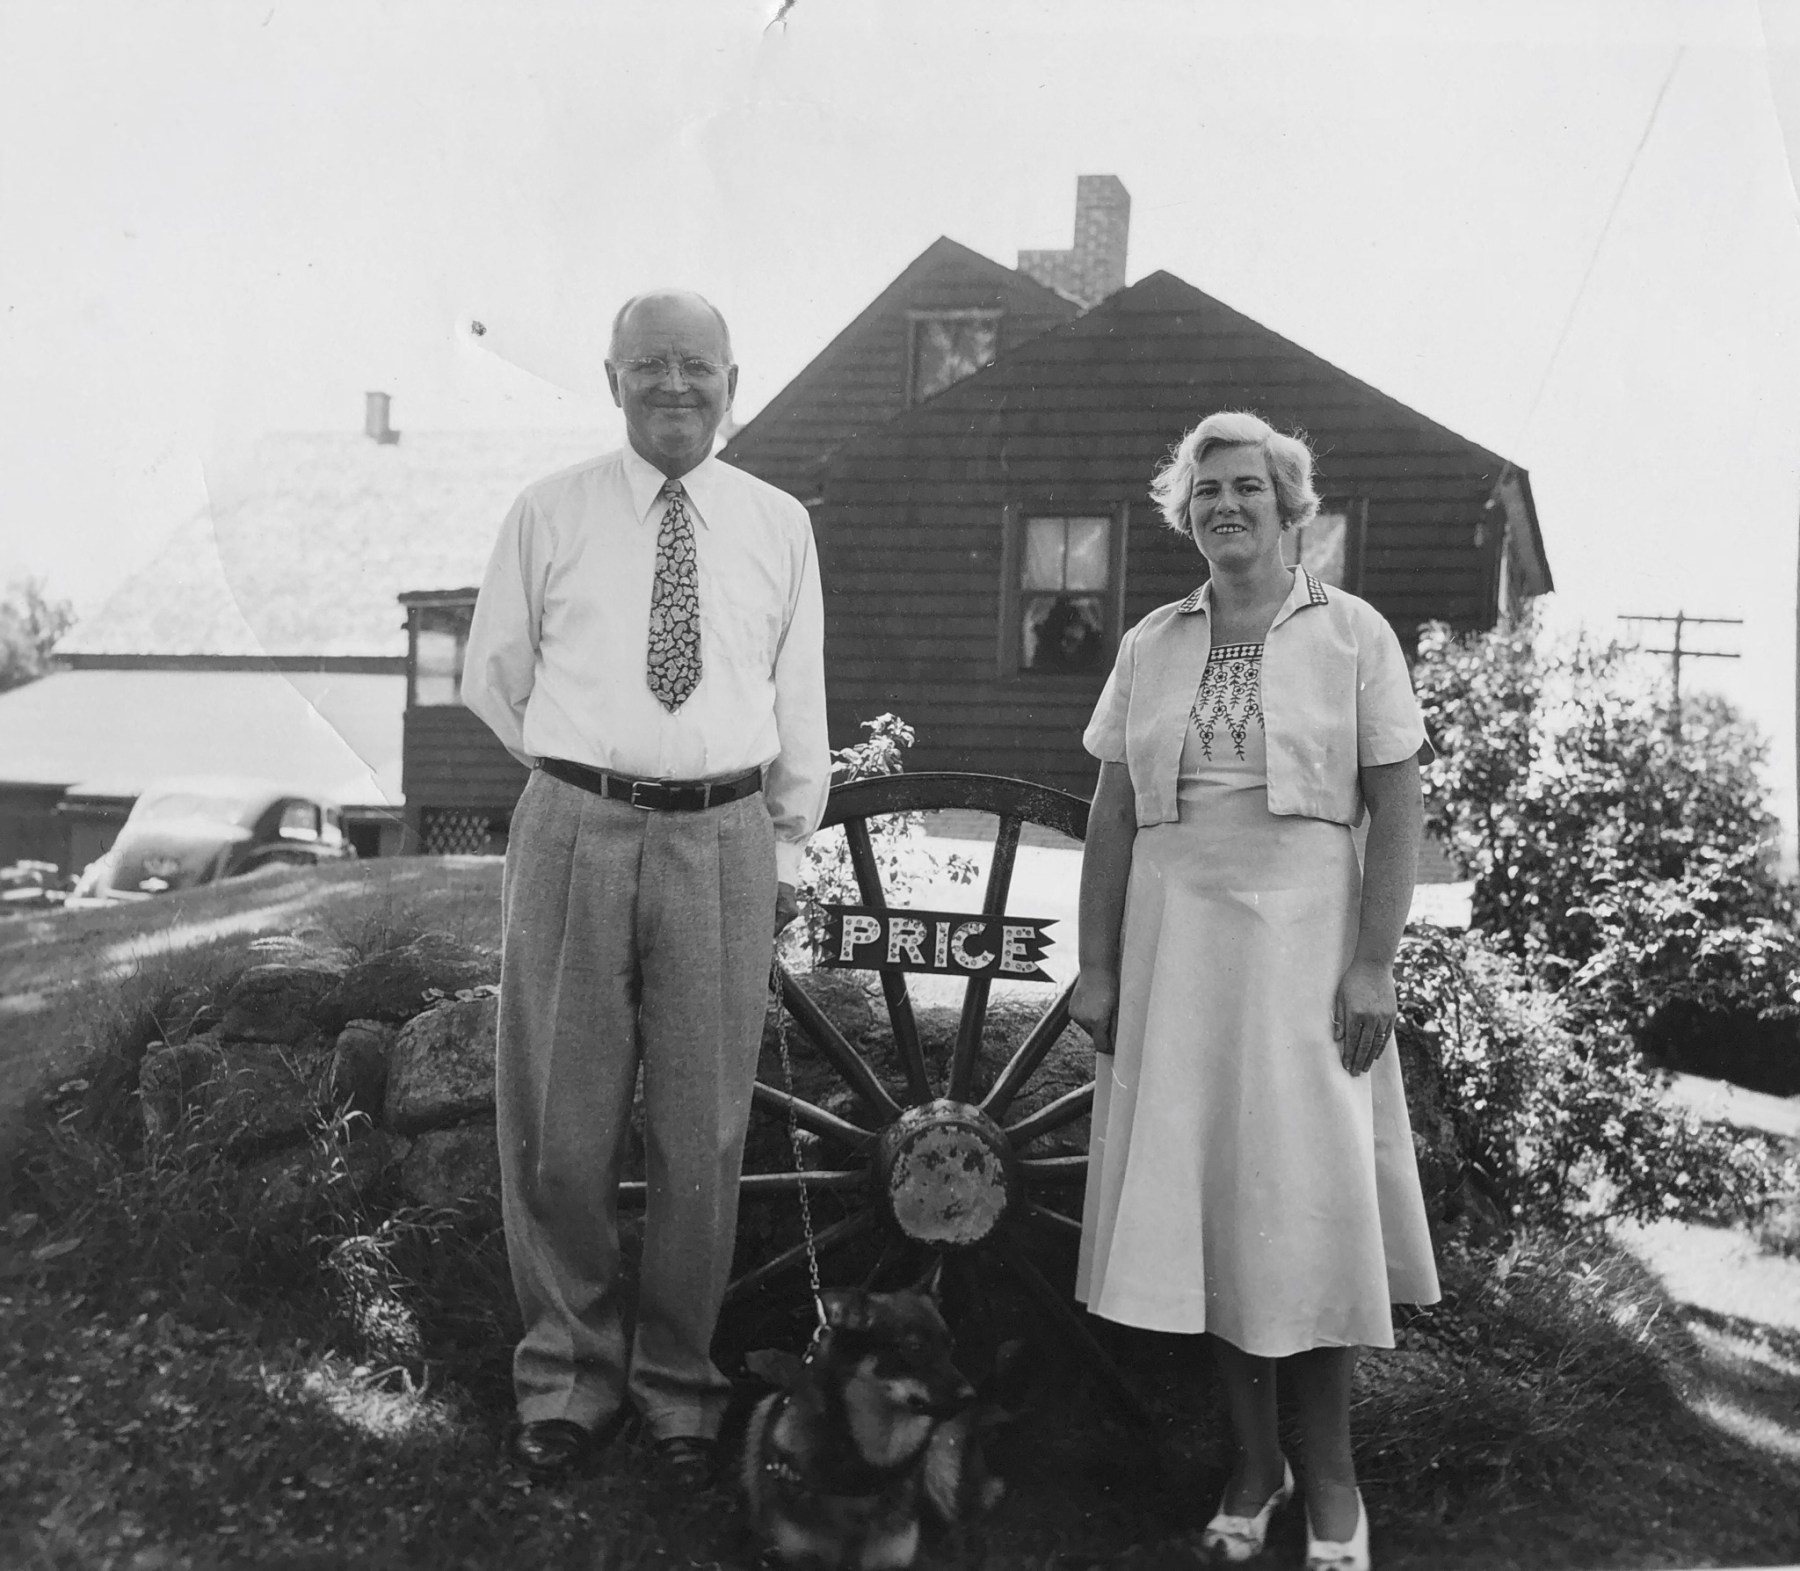 Hubert and Mary Price, Burlington MA